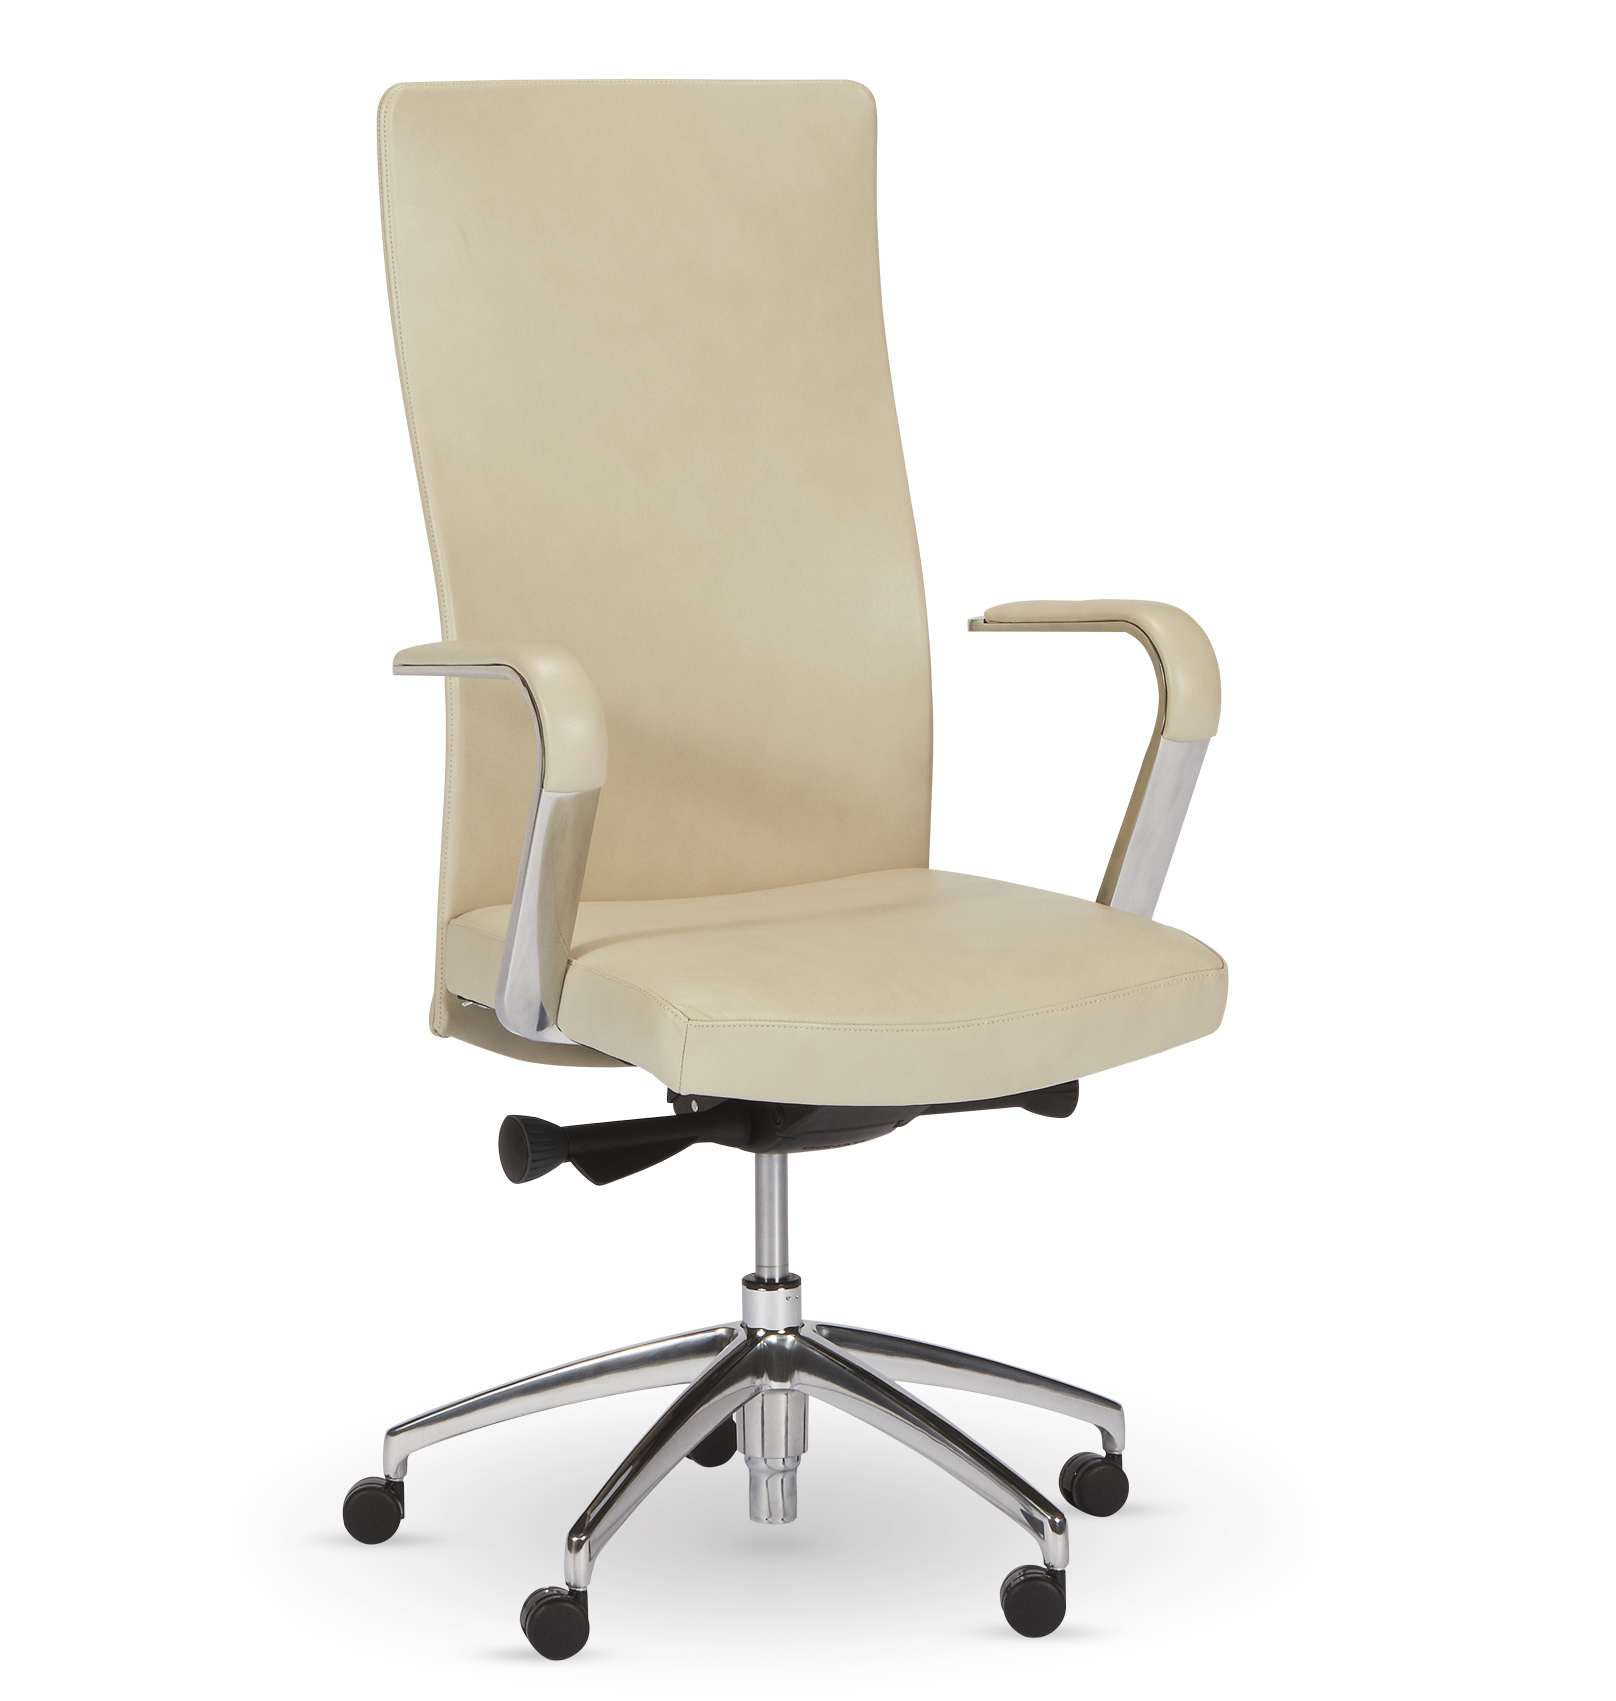 Sleek Desk Chair Home Office Chairs Han Moore Robb Stucky